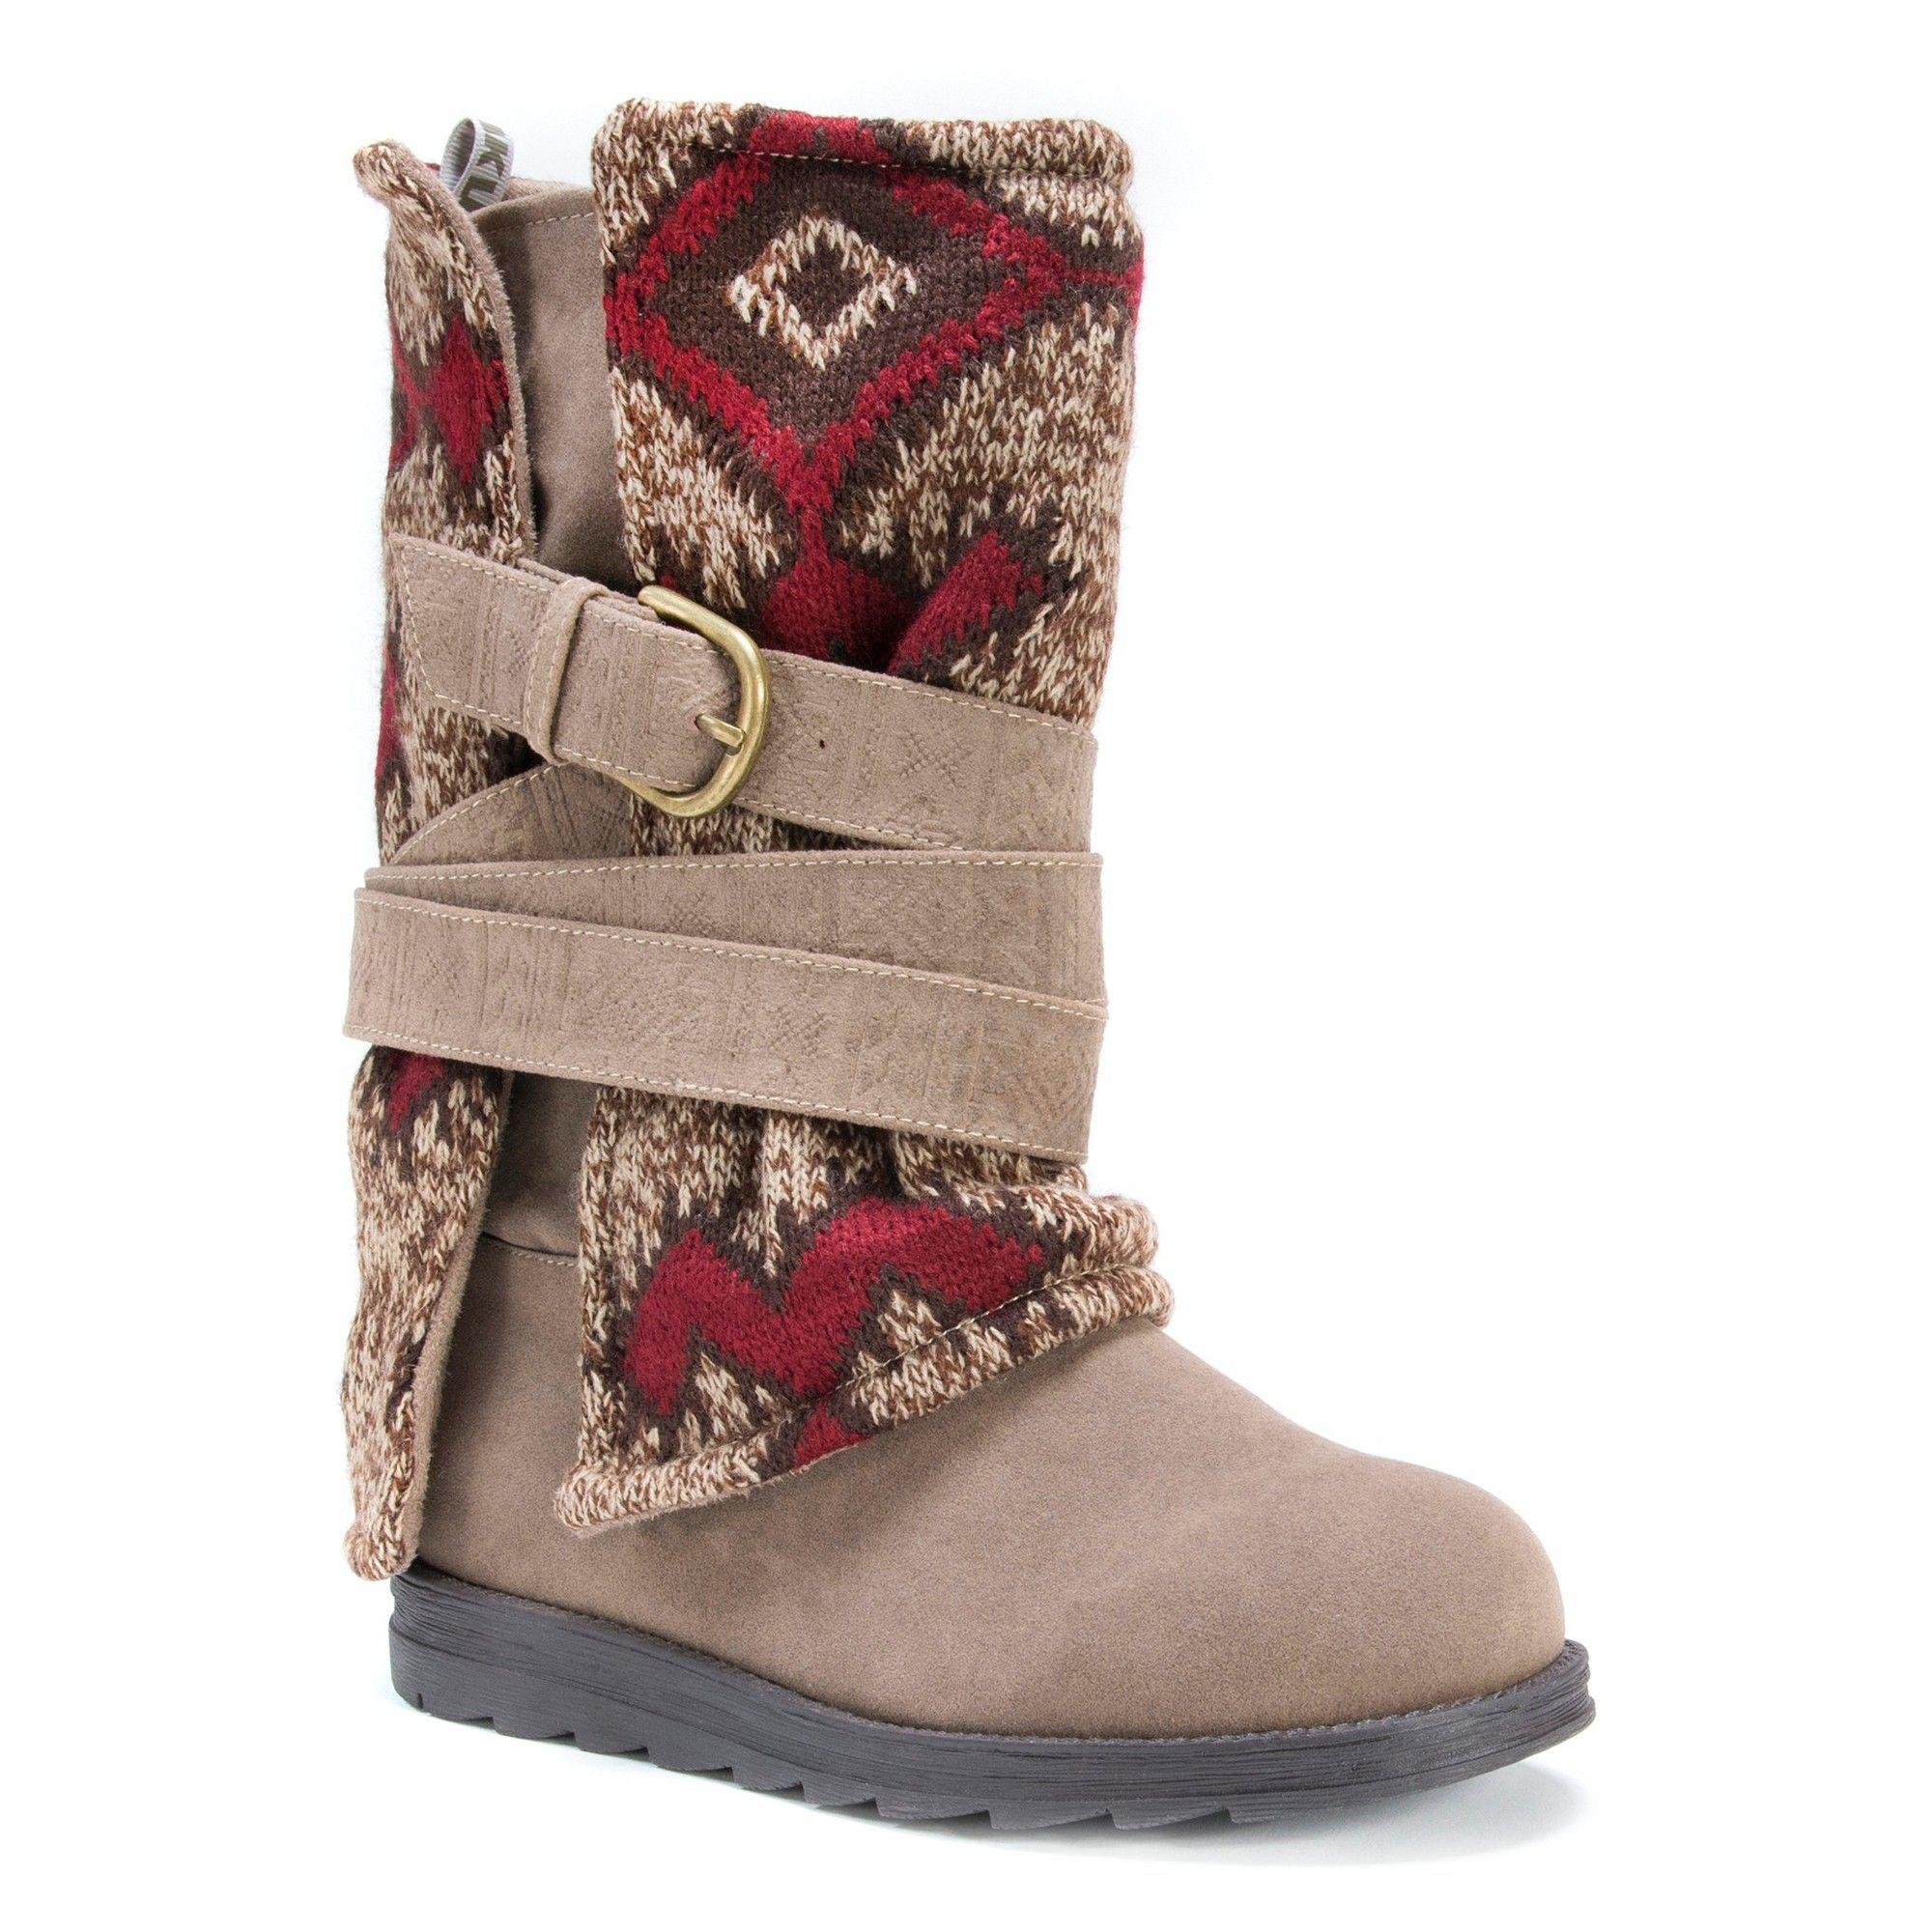 b0deae07e46 Women's Muk Luks Nevia Multi Strap Sweater Boots - Brown 7 ...